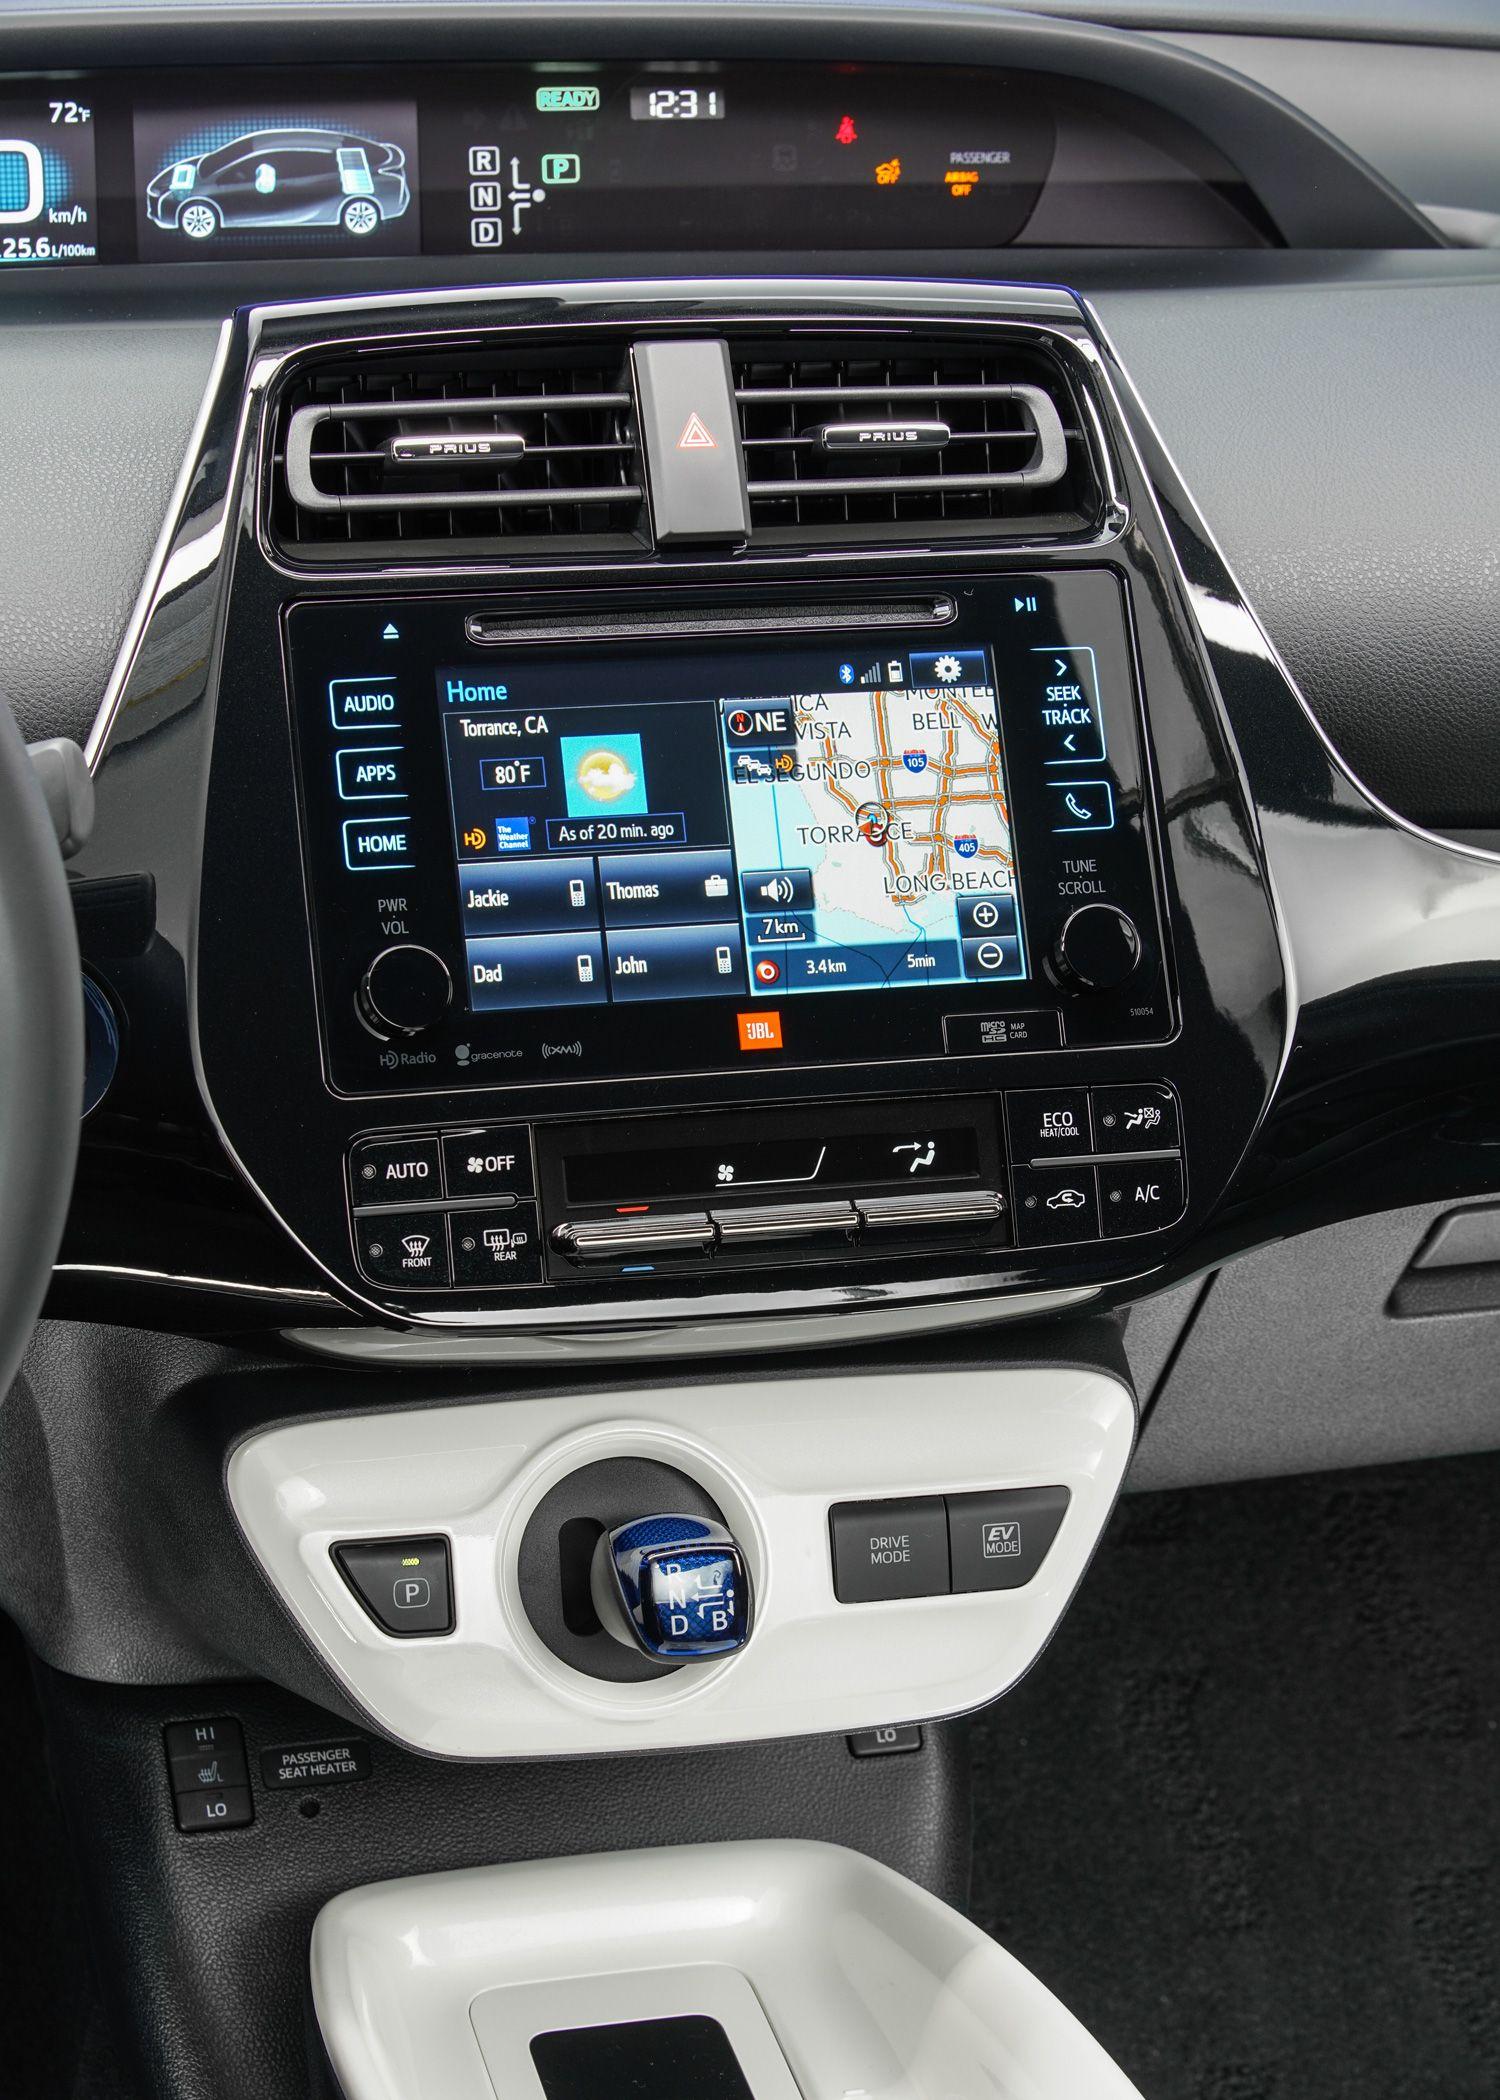 2016 Toyota Prius Http Www Savannahtoyota Com Motorlar Arabalar